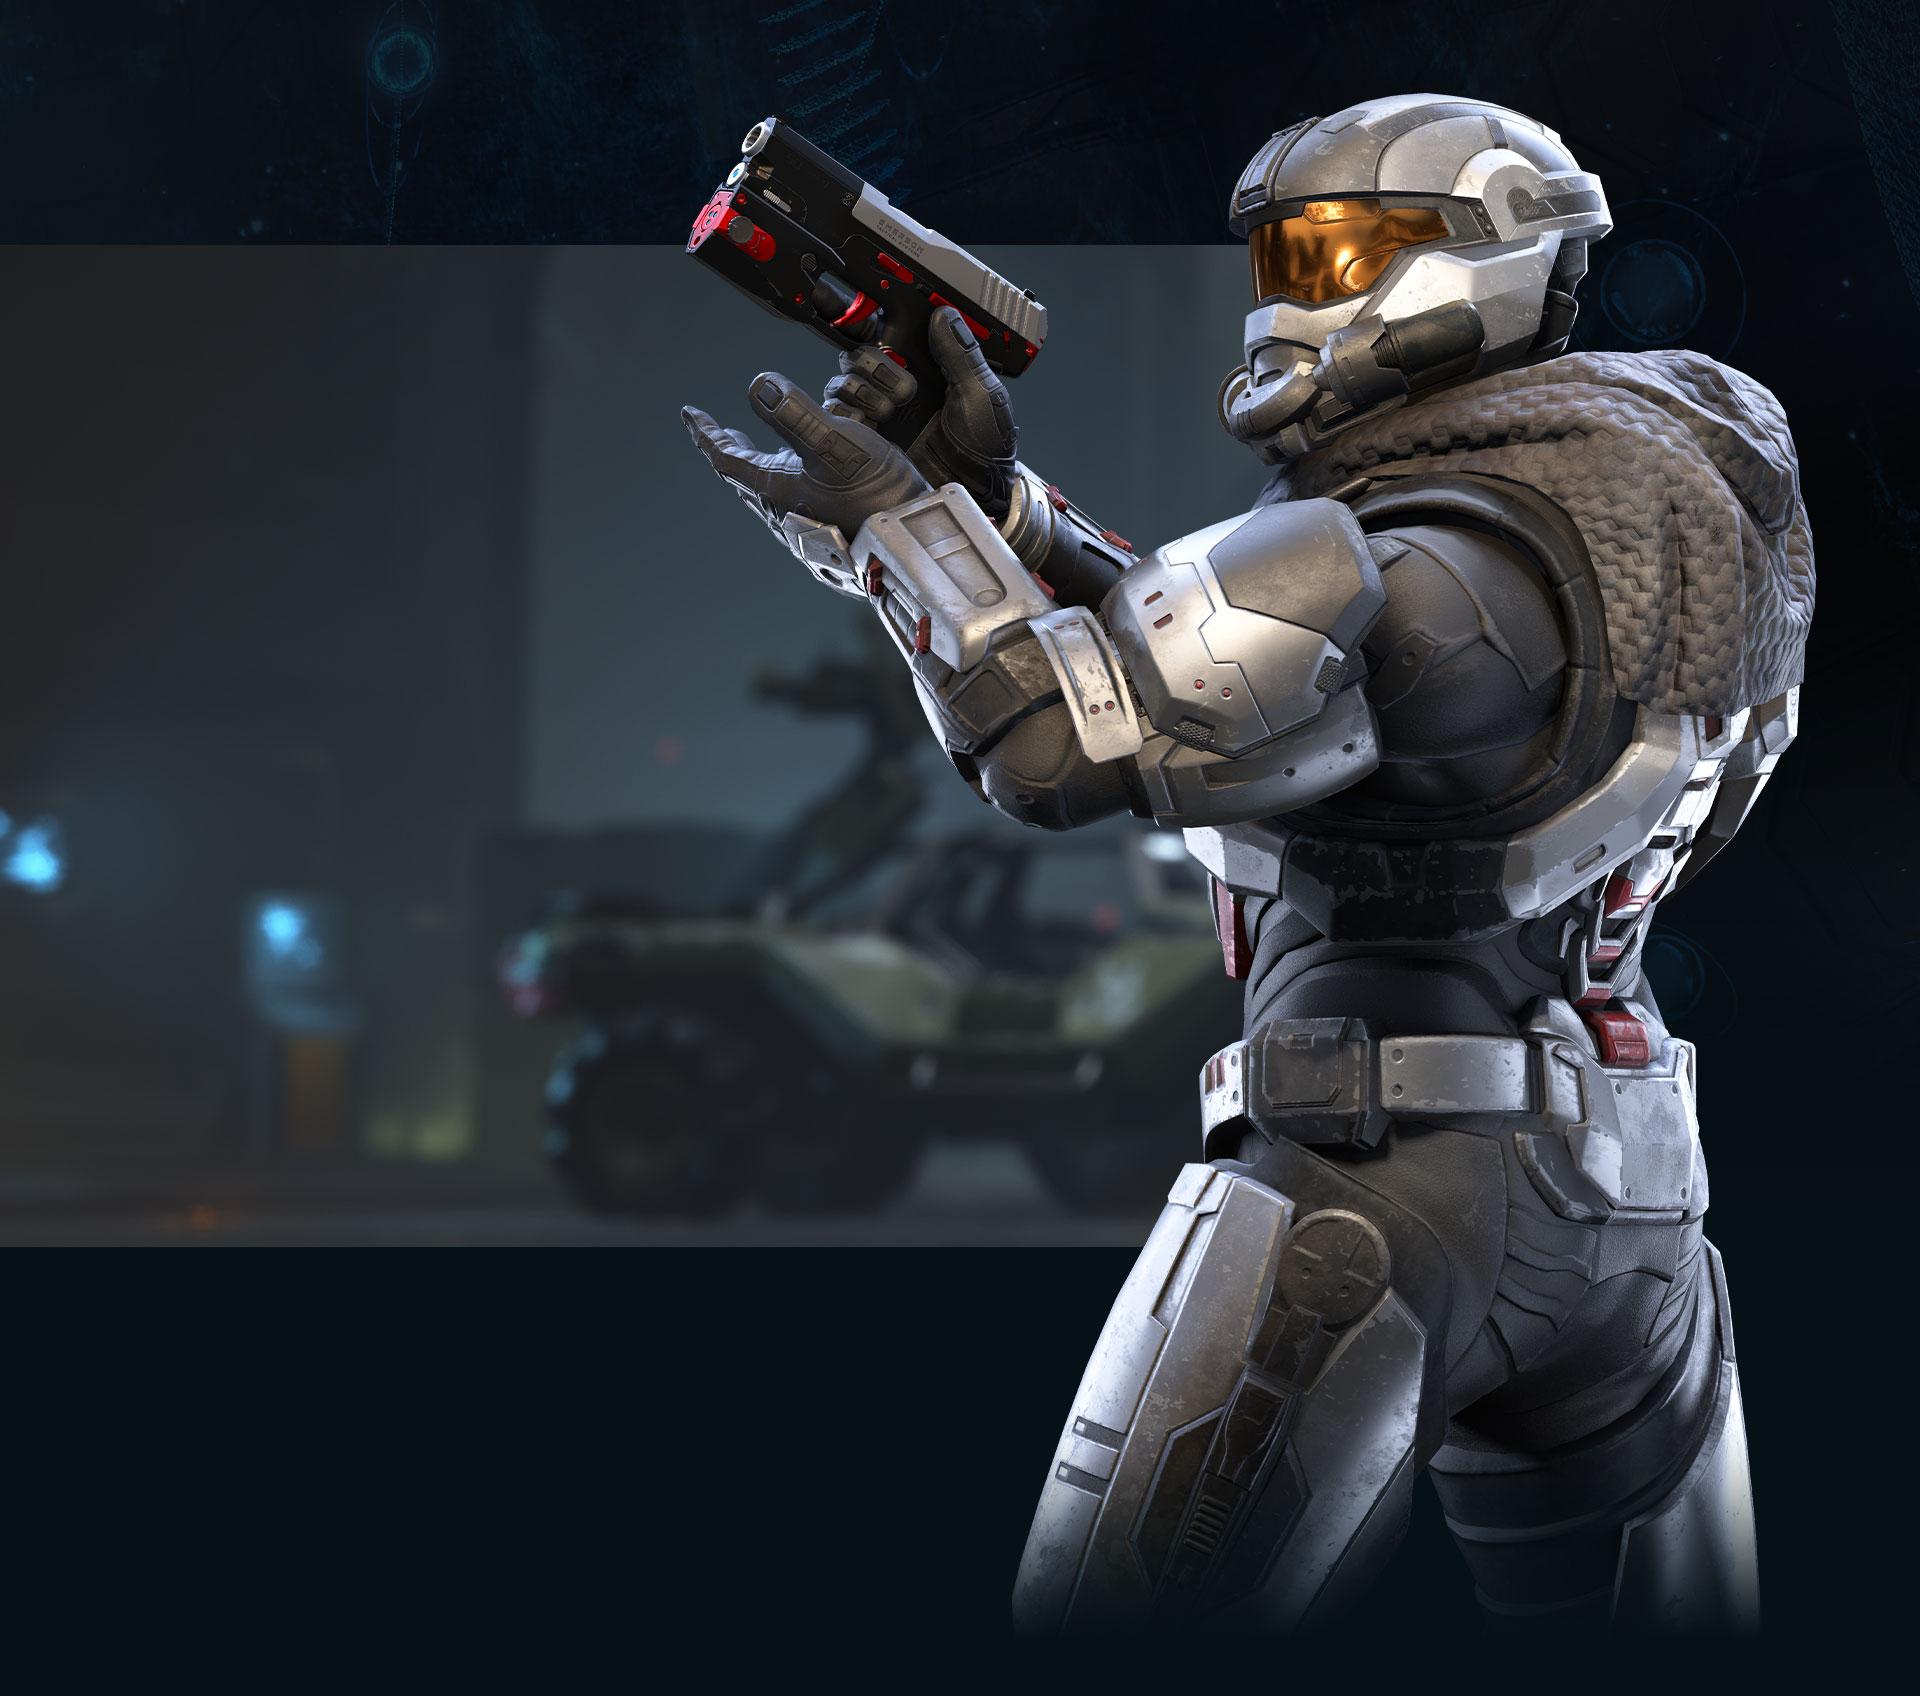 Uno Spartan in posa con una pistola appena ricaricata